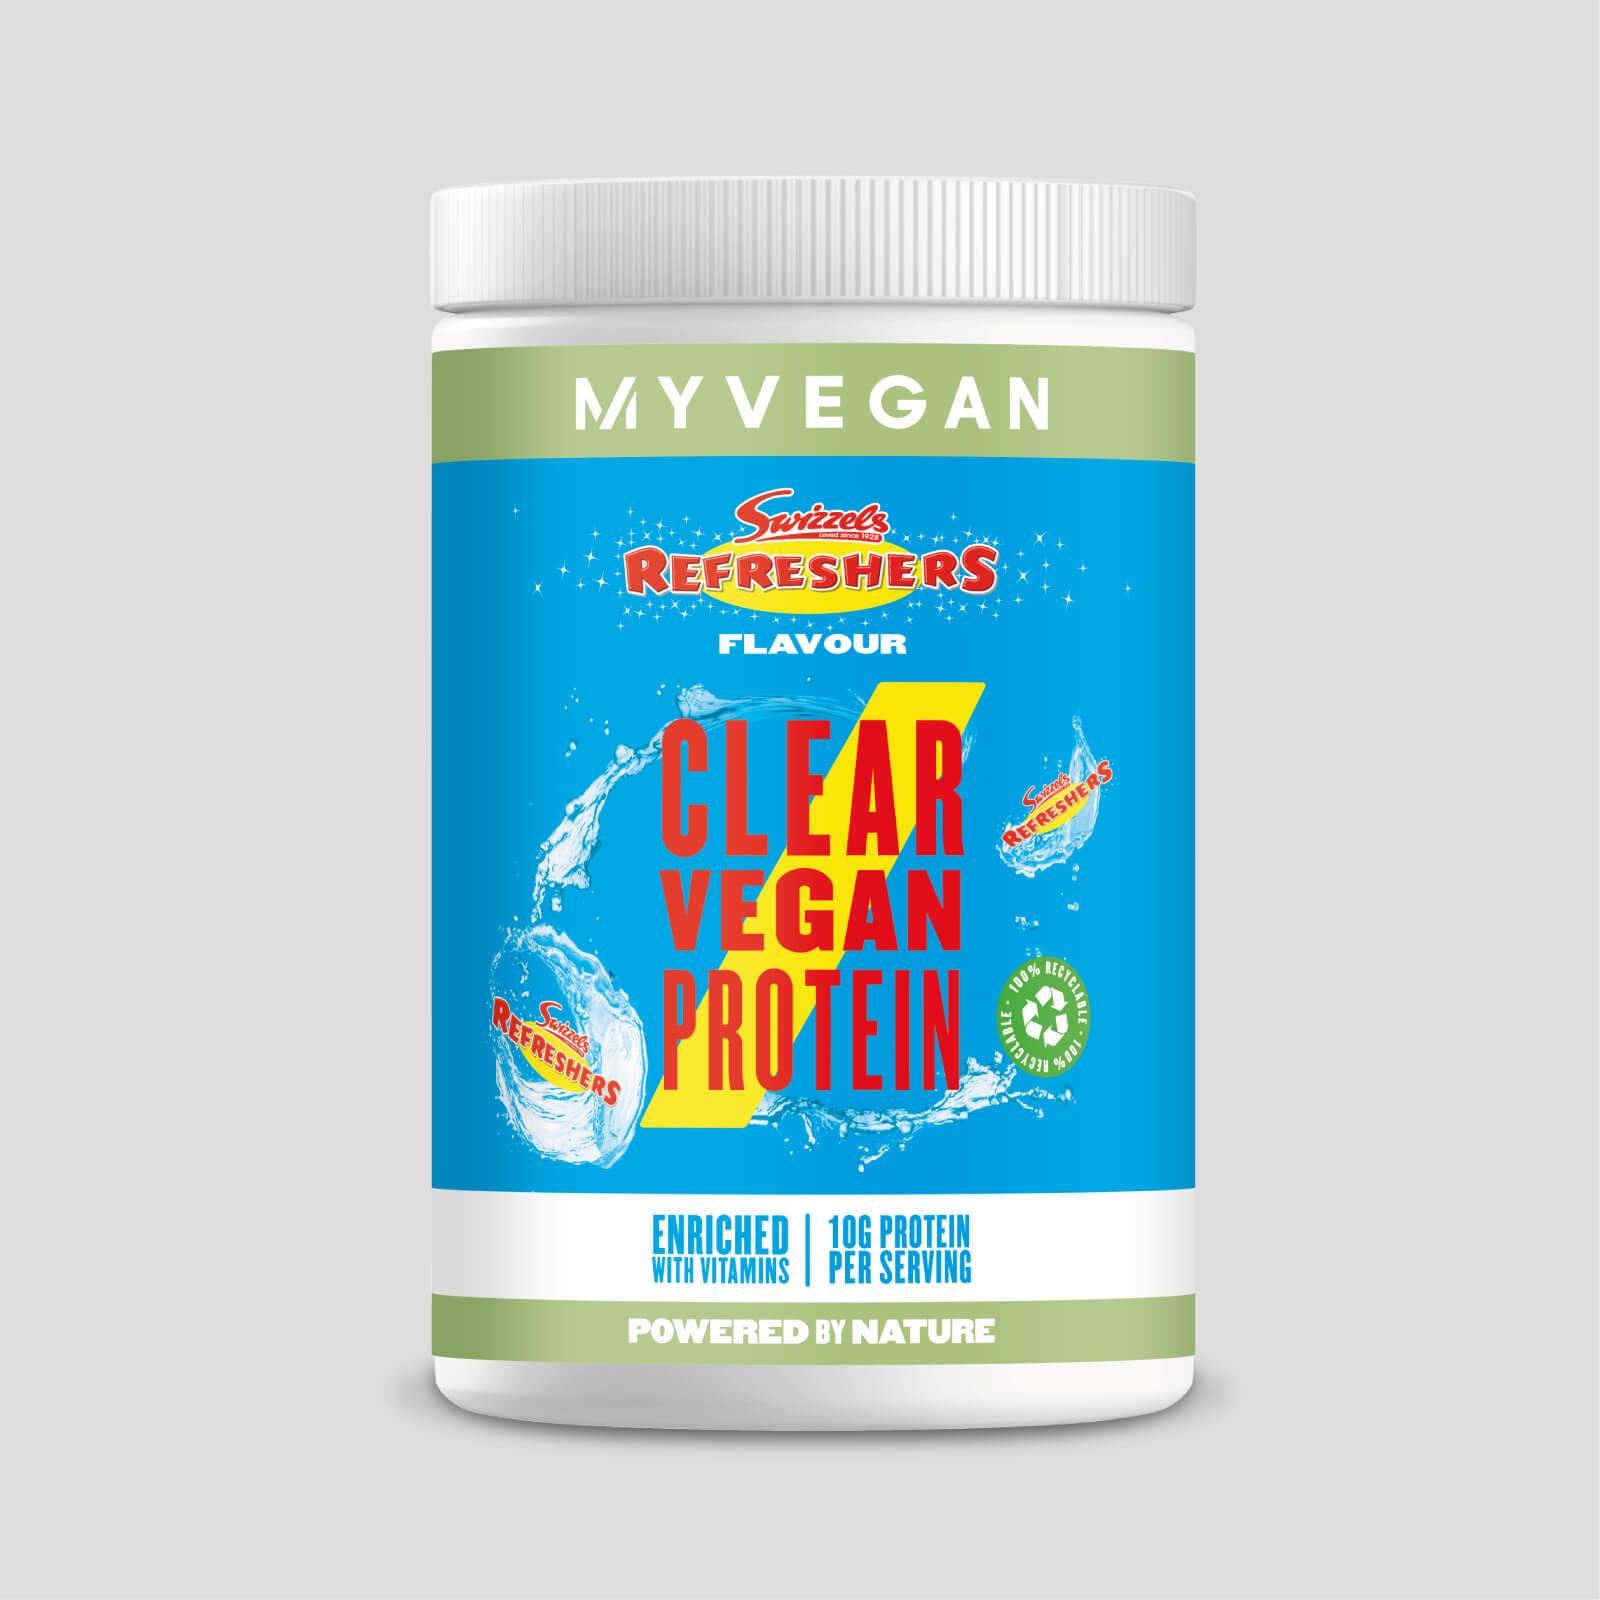 Myvegan Clear Vegan Protein - 10servings - Swizzels - Refreshers